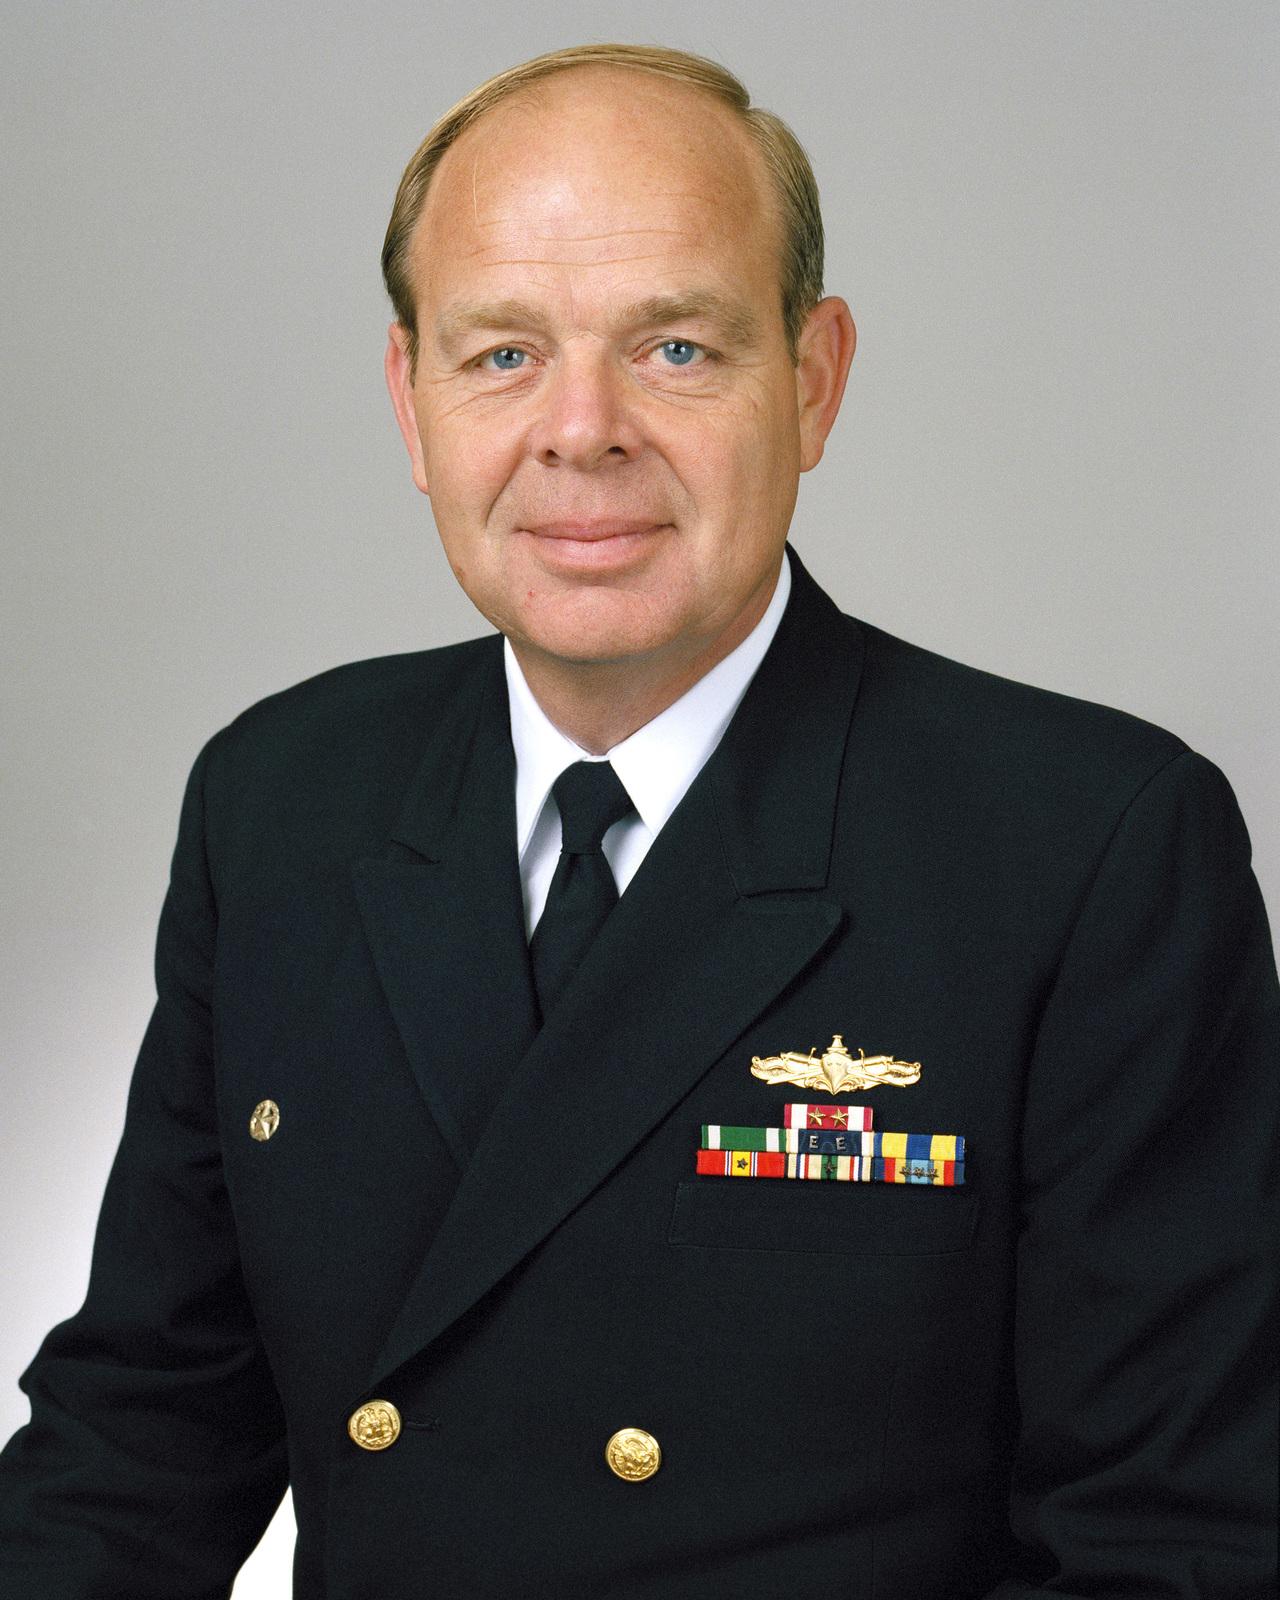 Rear Admiral (lower half) Edward K. Kristensen, USN selectee (uncovered)